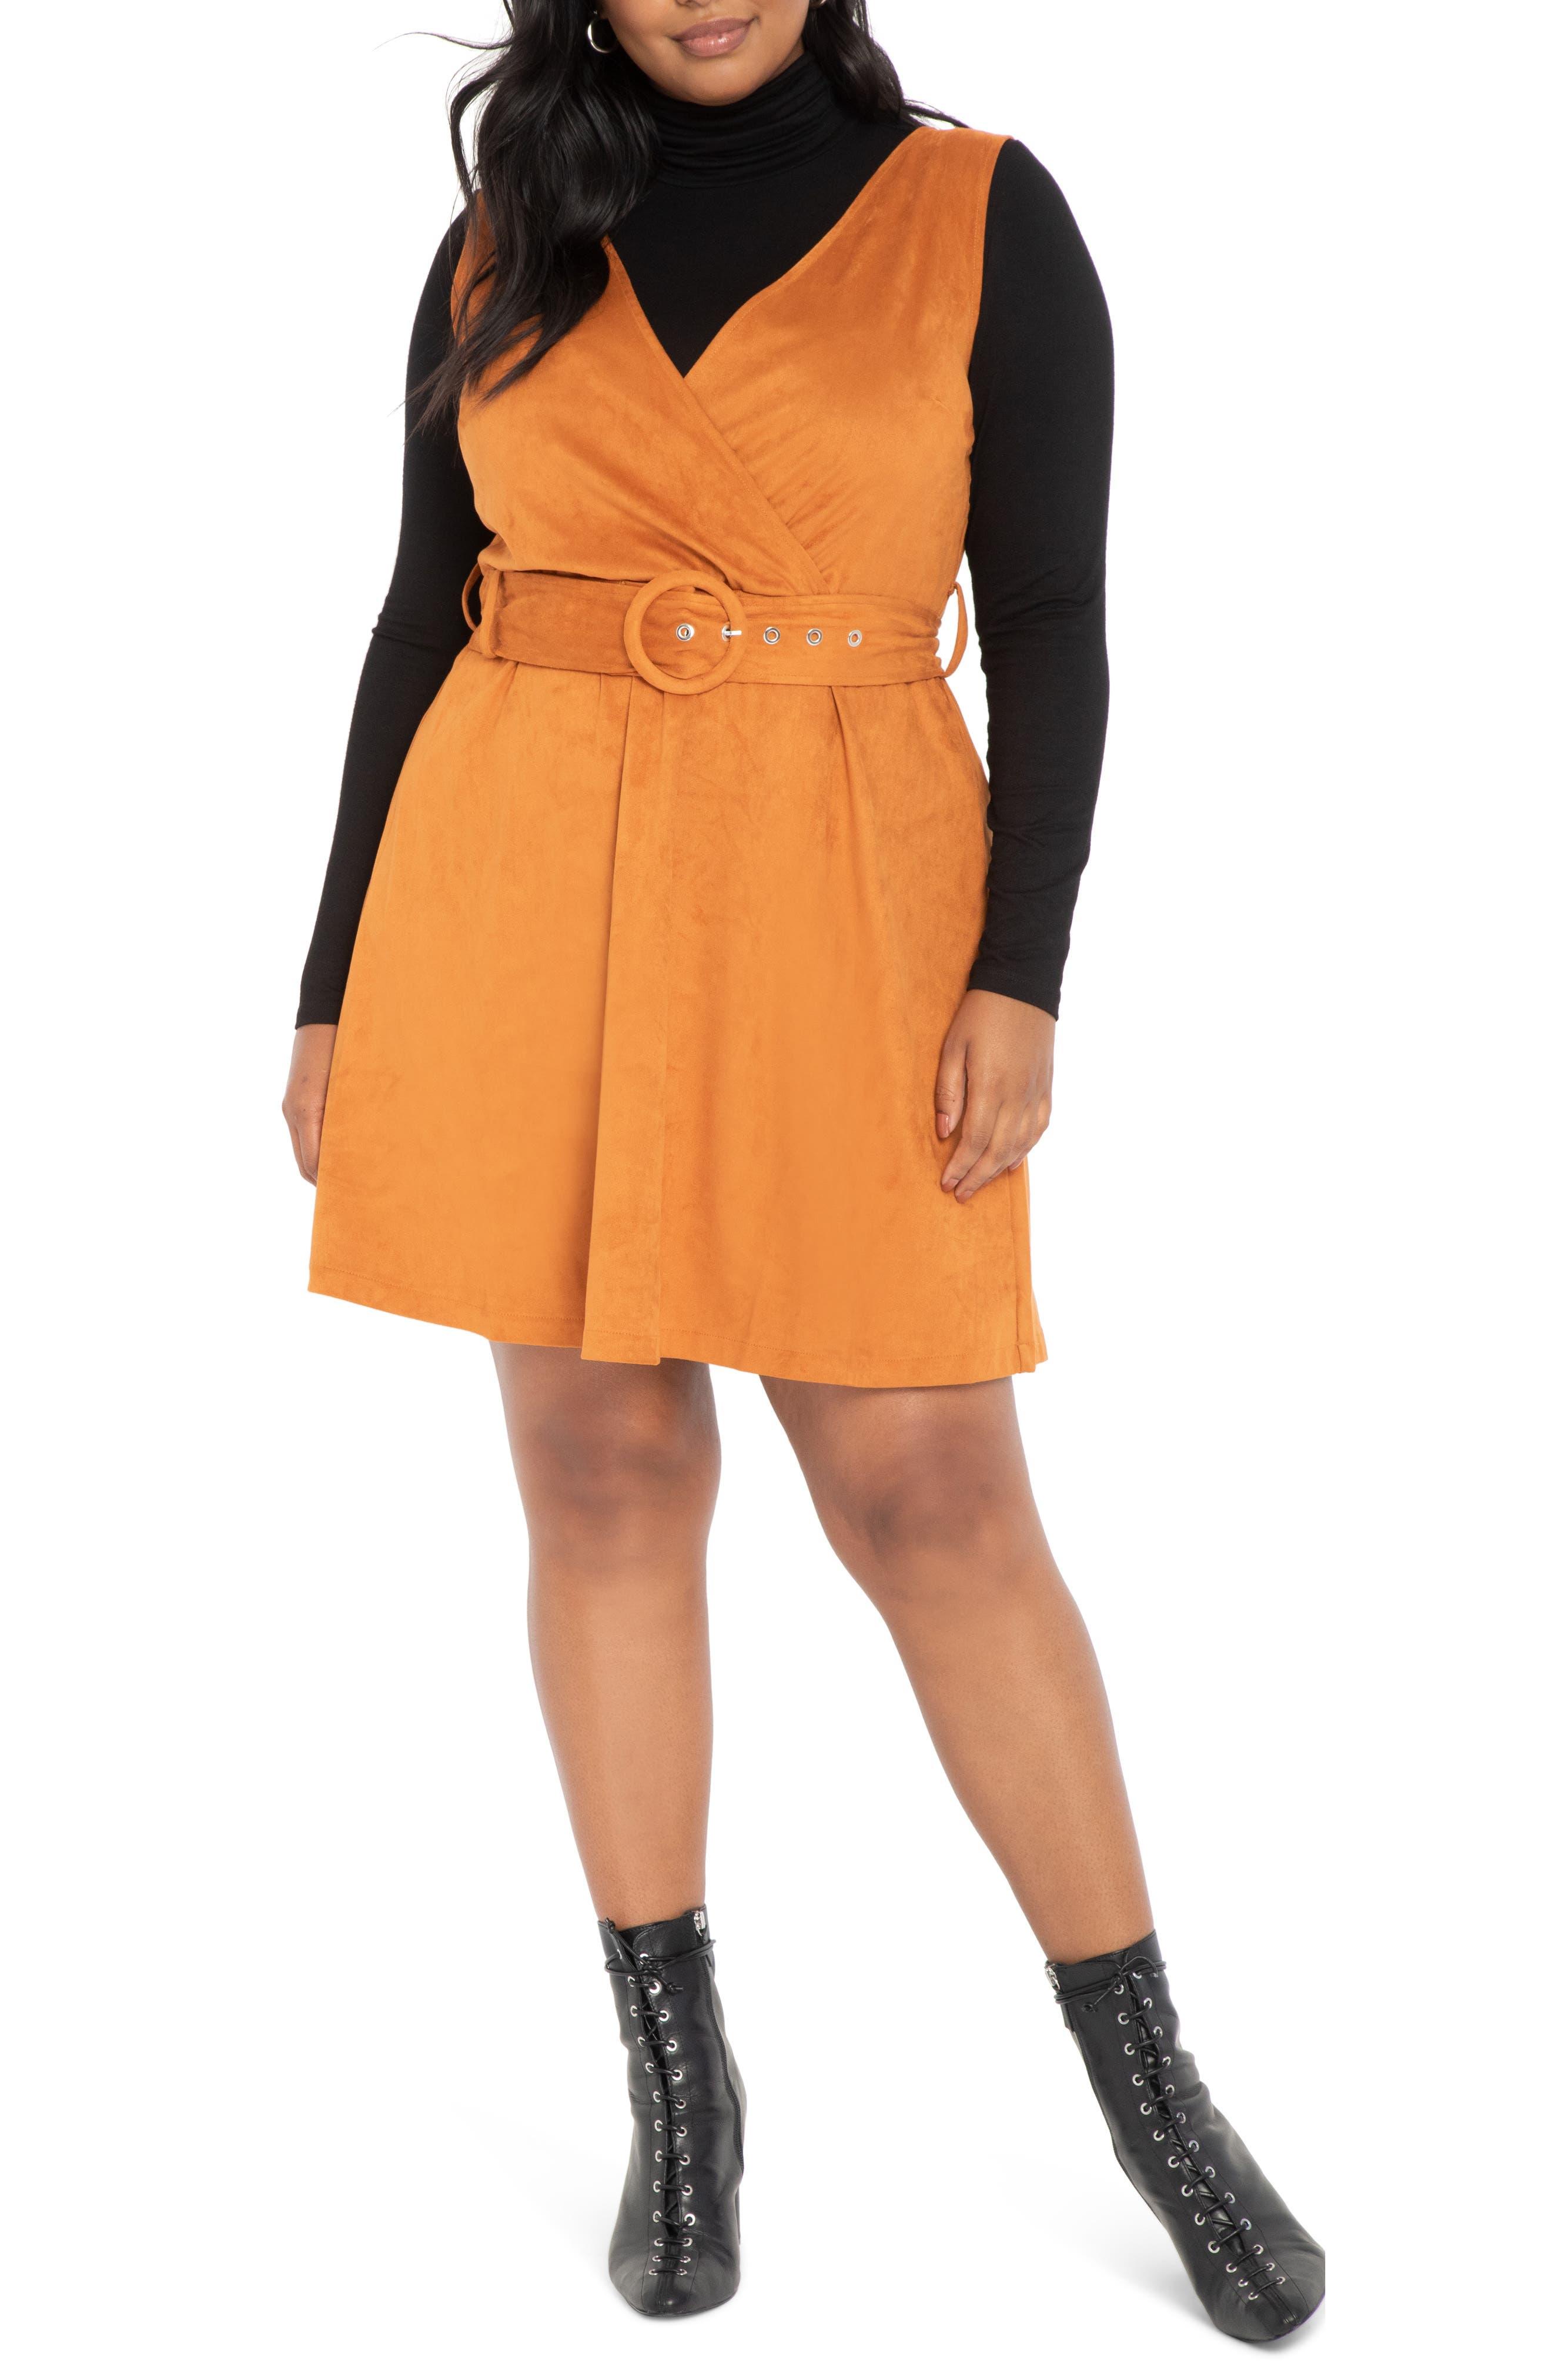 70s Clothes | Hippie Clothes & Outfits Plus Size Womens Eloquii Faux Suede Jumper Dress Size 14W - Brown $89.98 AT vintagedancer.com